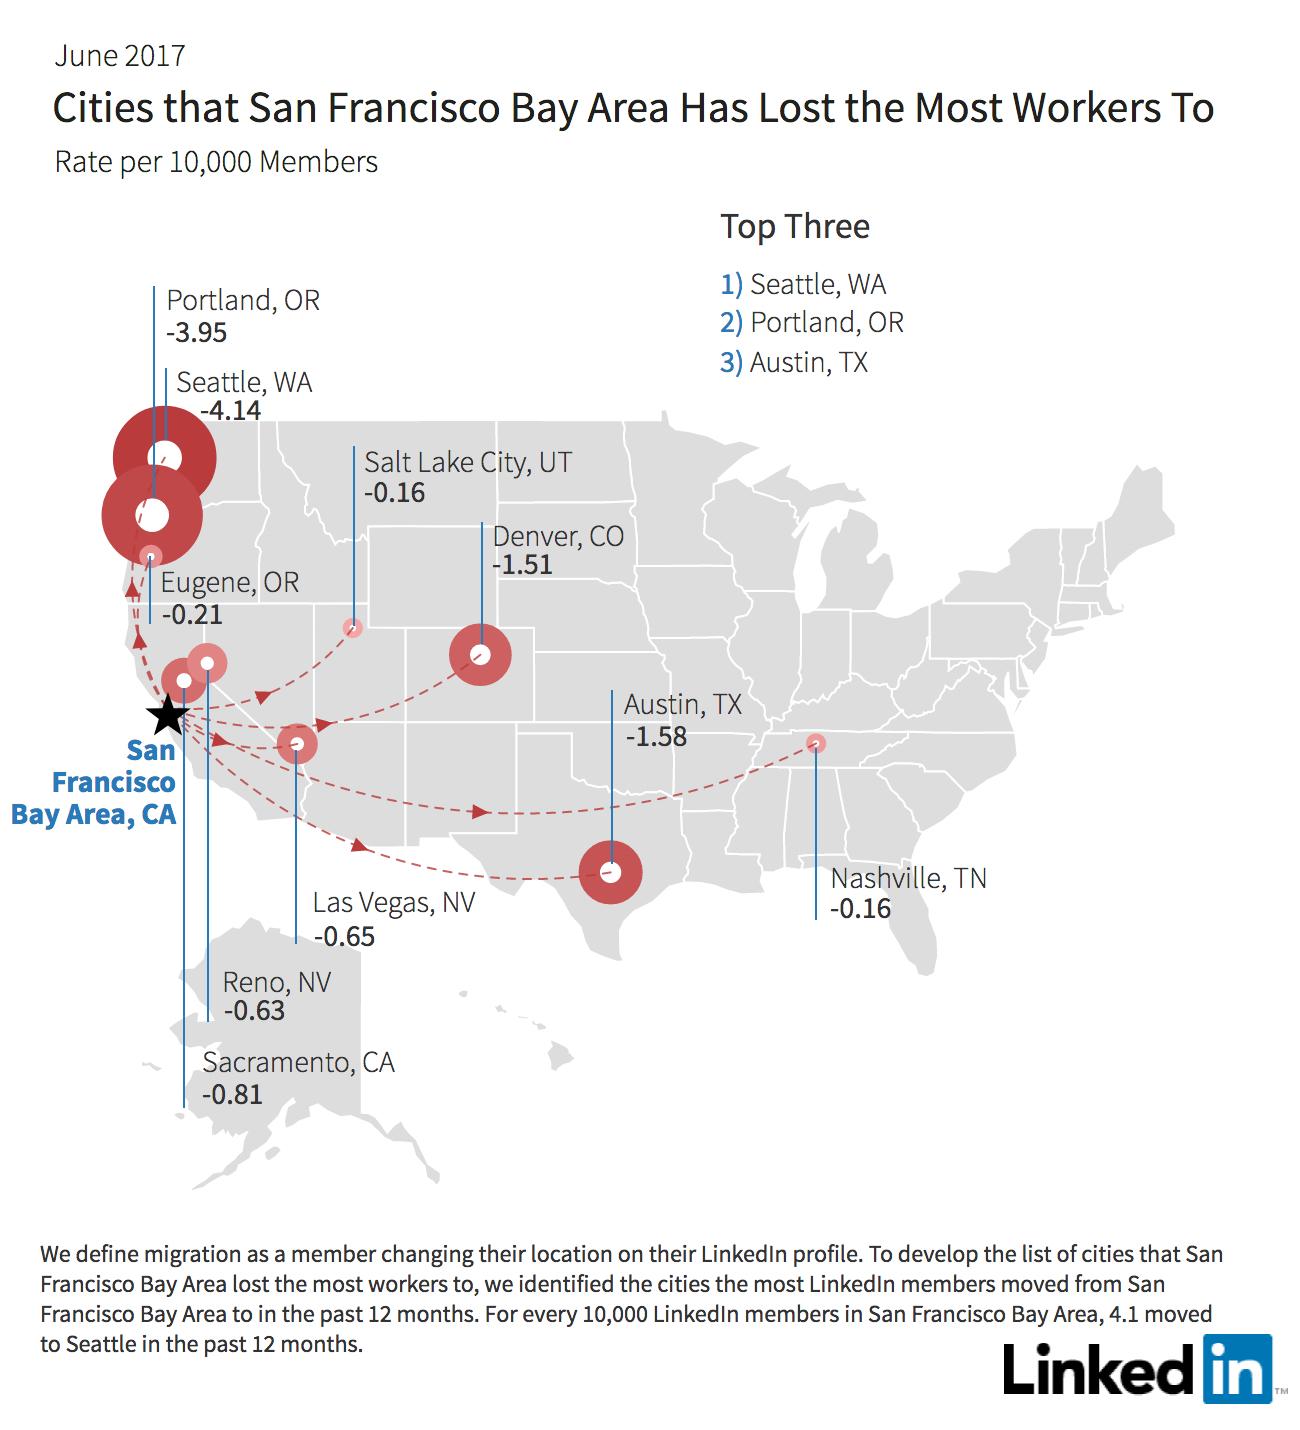 Silicon Valley LinkedIn